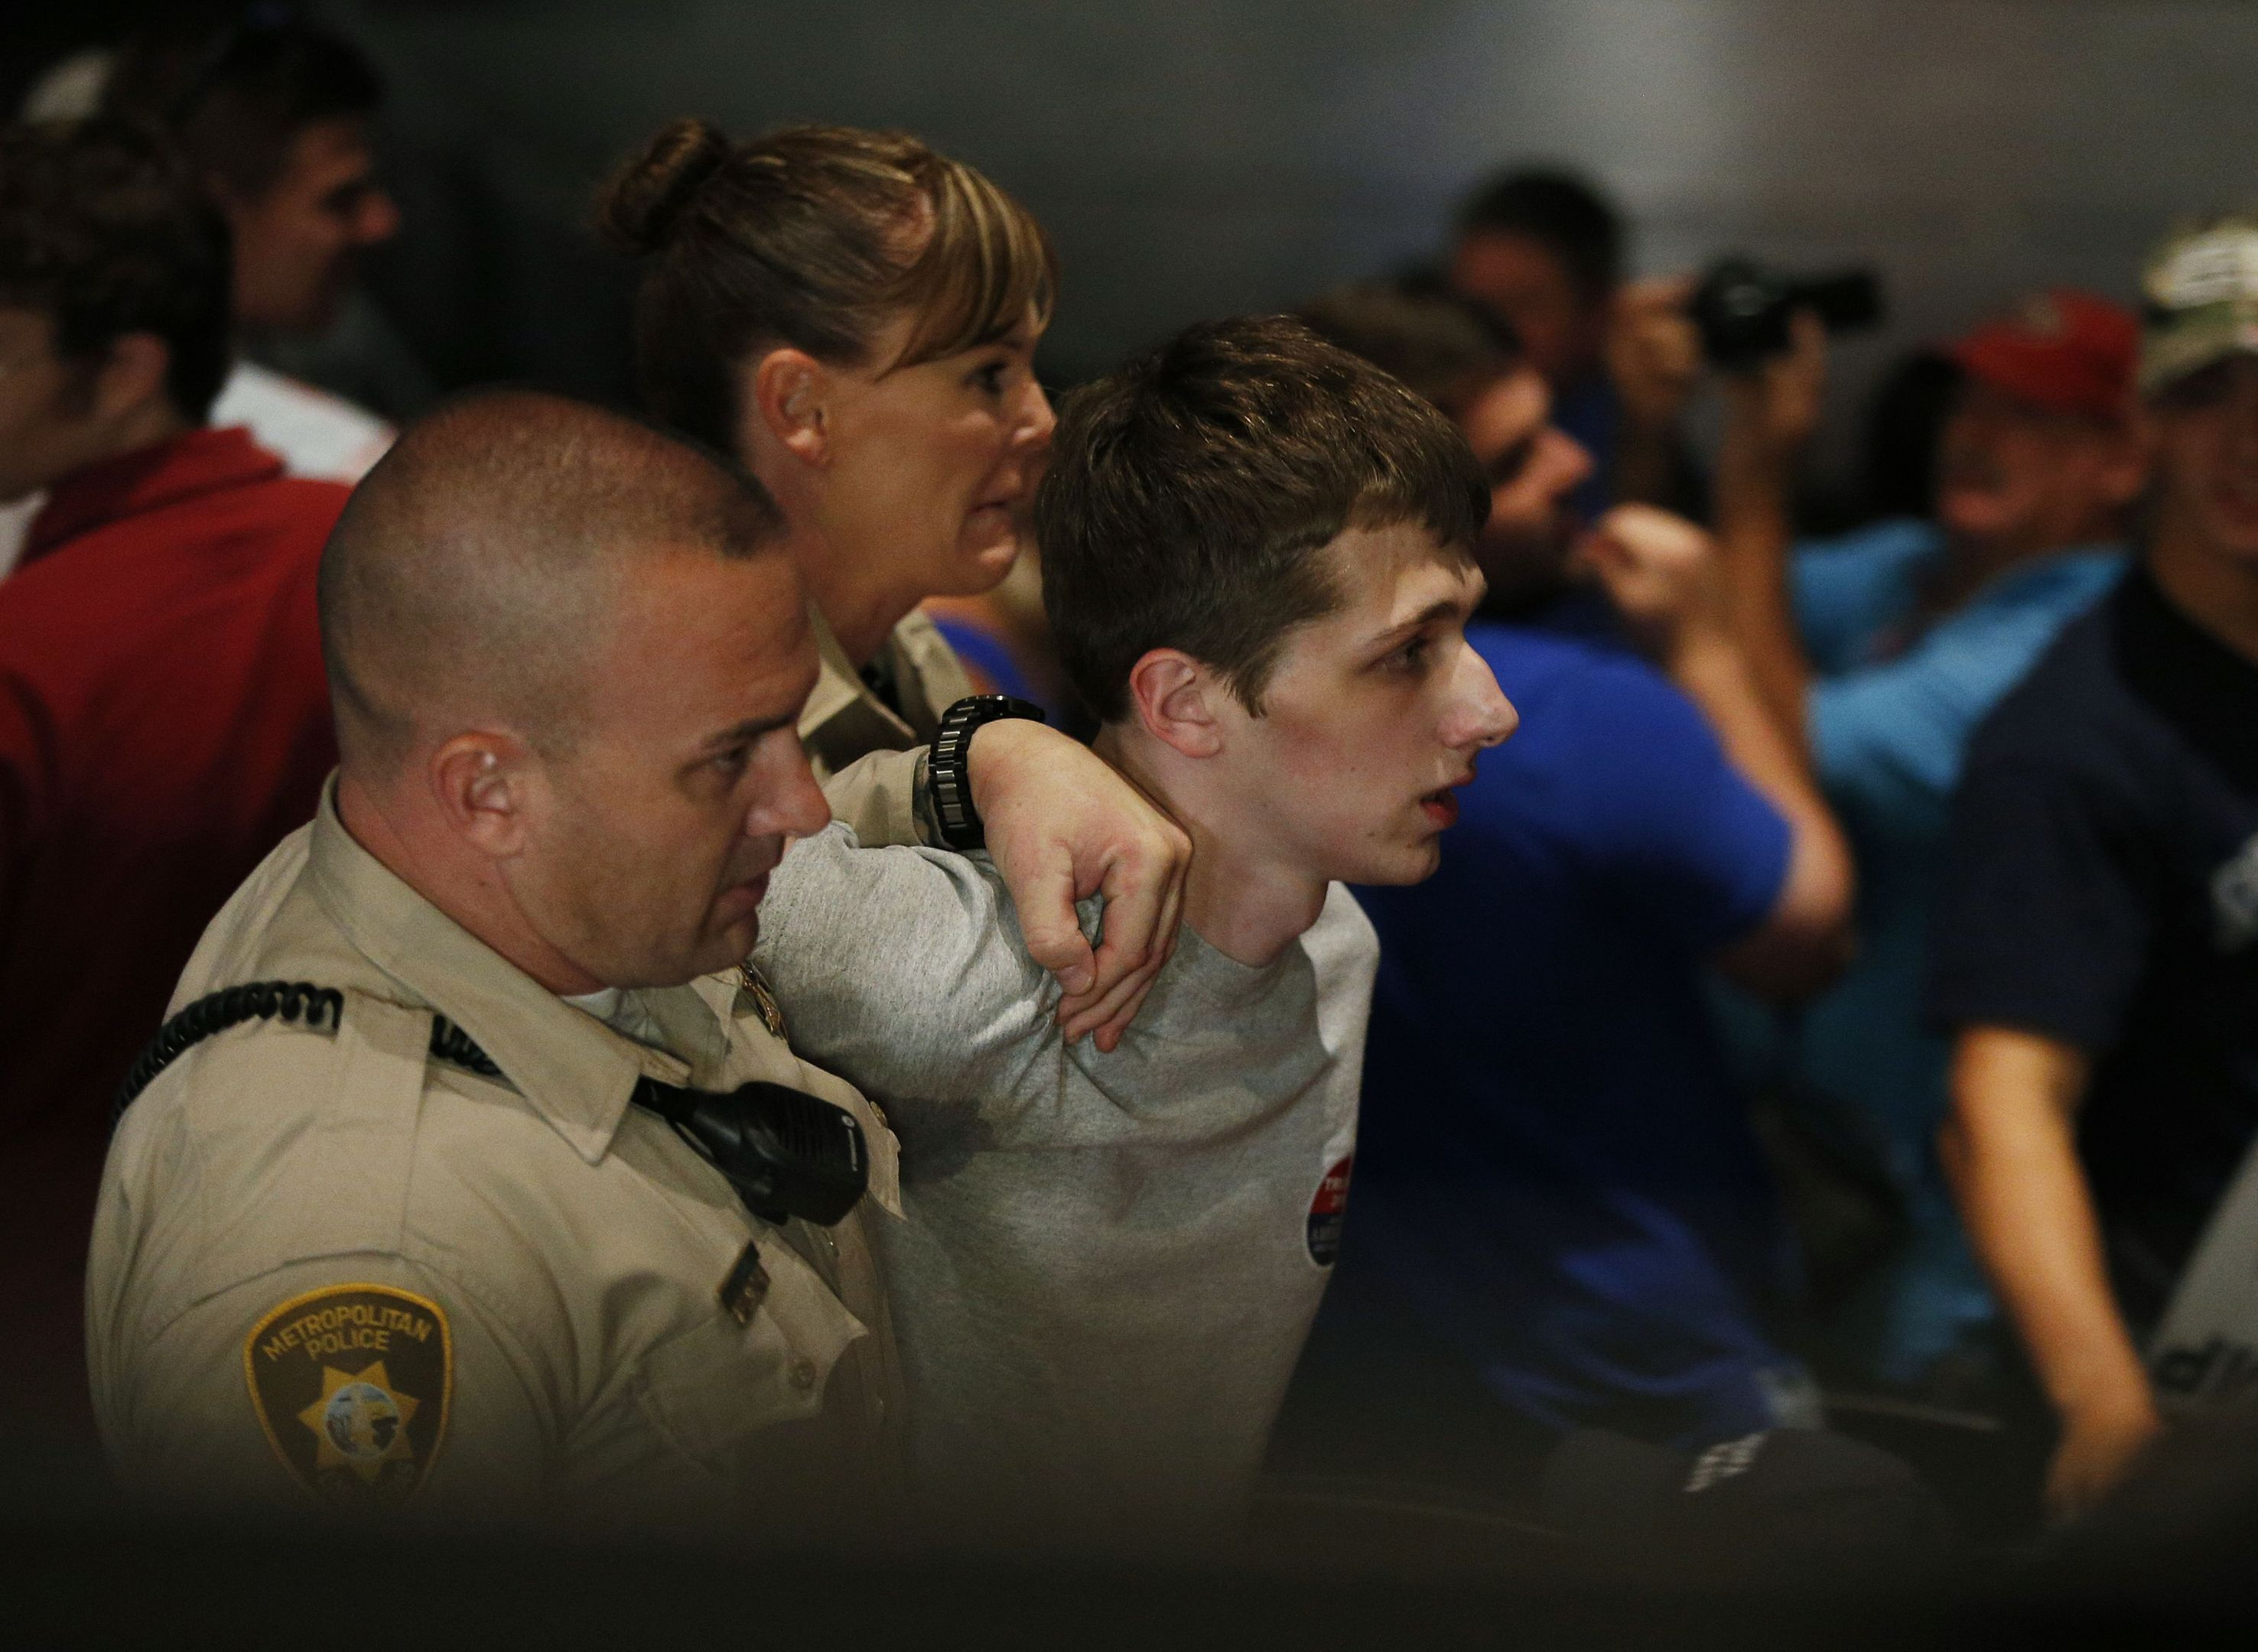 Michael Sandford was refused bail.